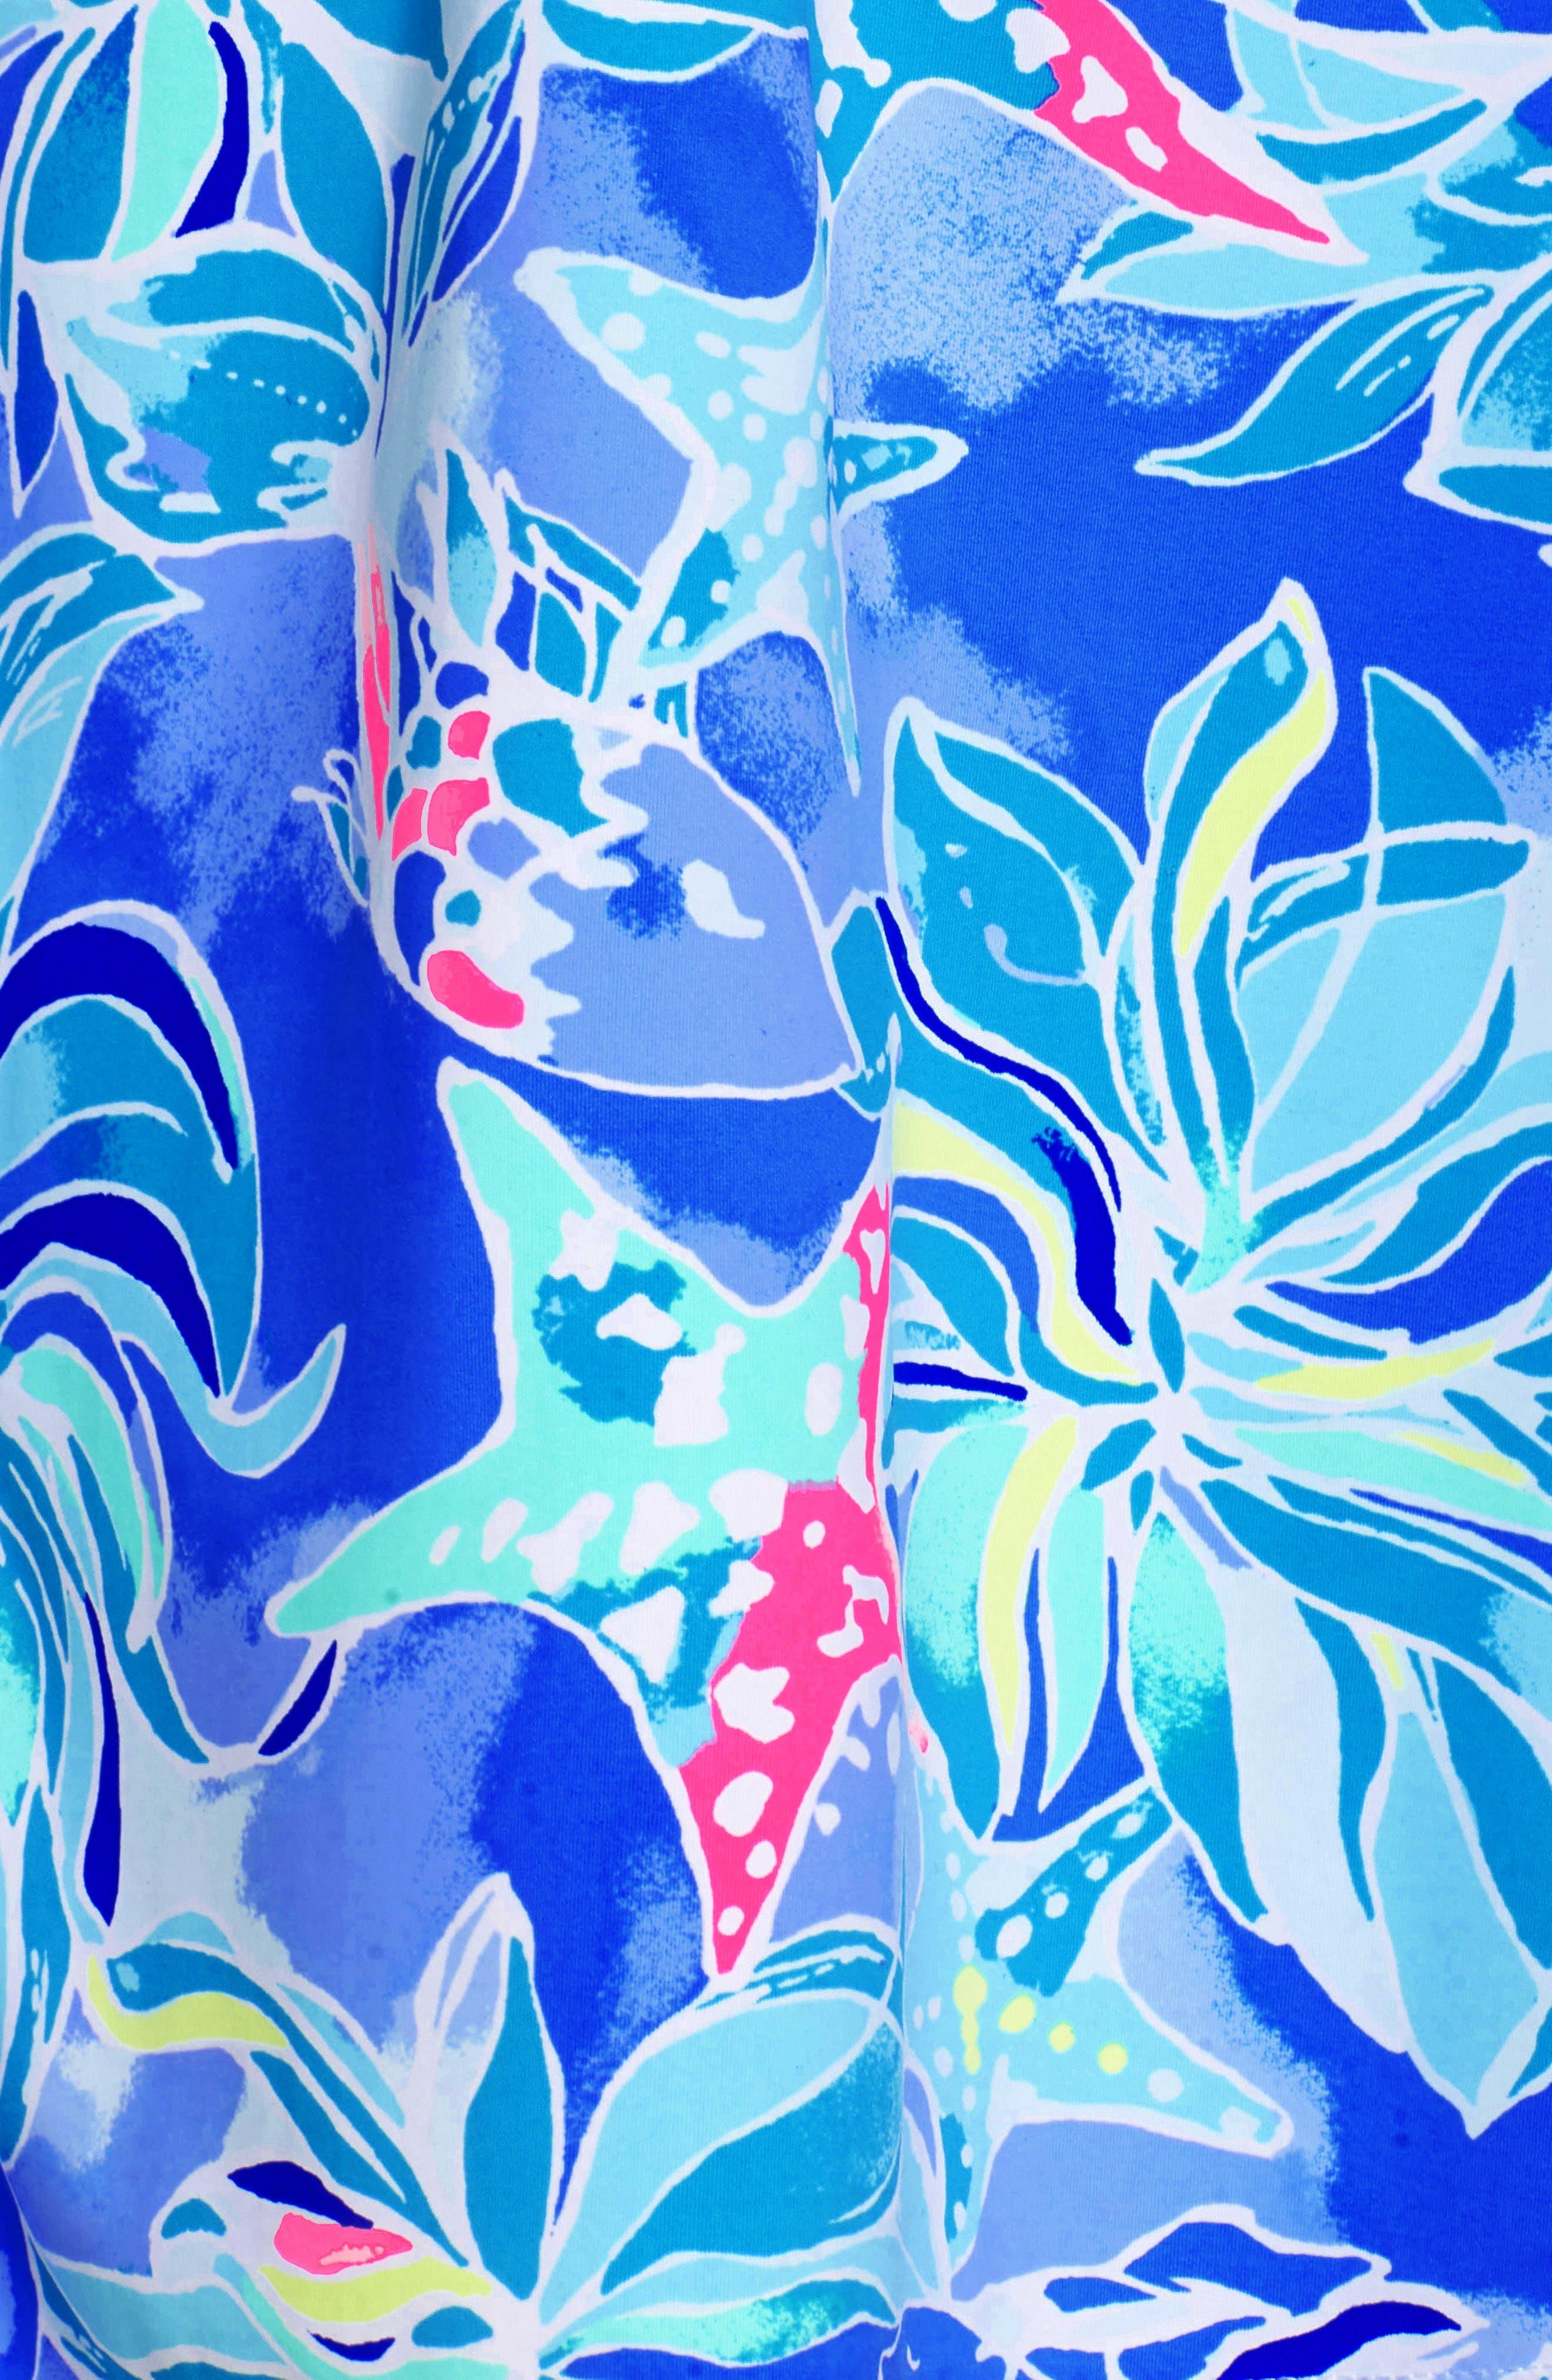 Margarete Cover-Up,                             Alternate thumbnail 6, color,                             BENNET BLUE CELESTIAL SEAS